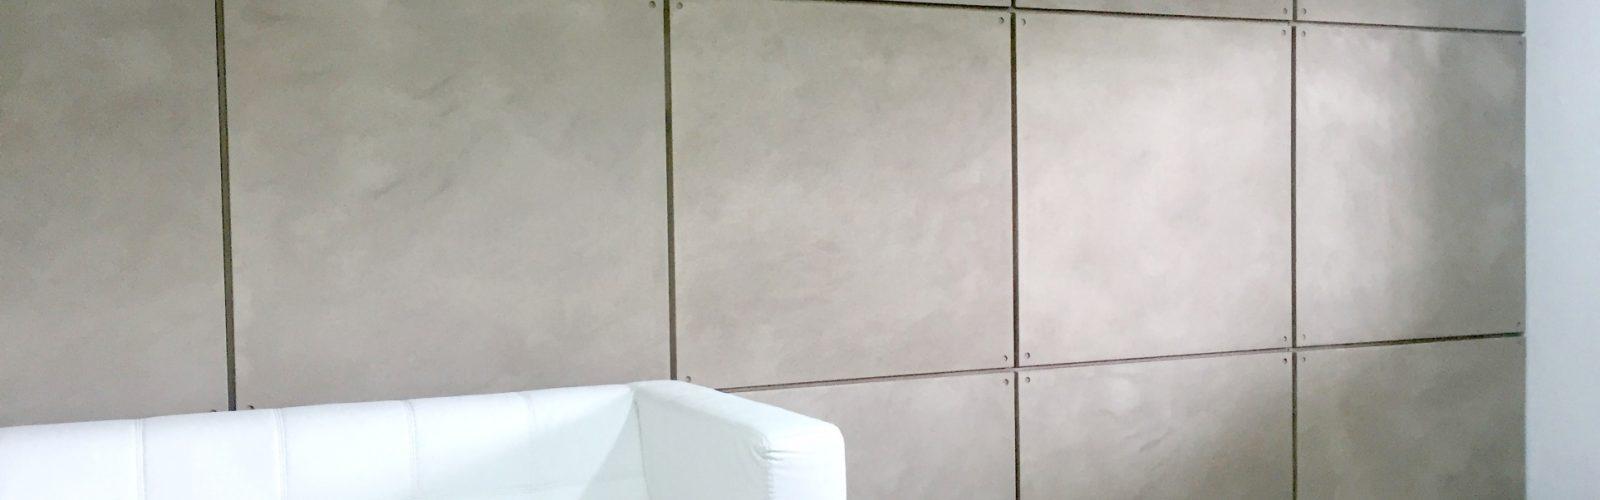 Panele Dekorative Betoni - Panele Betoni - Imitim Betoni - Pllaka Imitim Betoni - Produkte per Arredim Industrial nga Dekor Italy